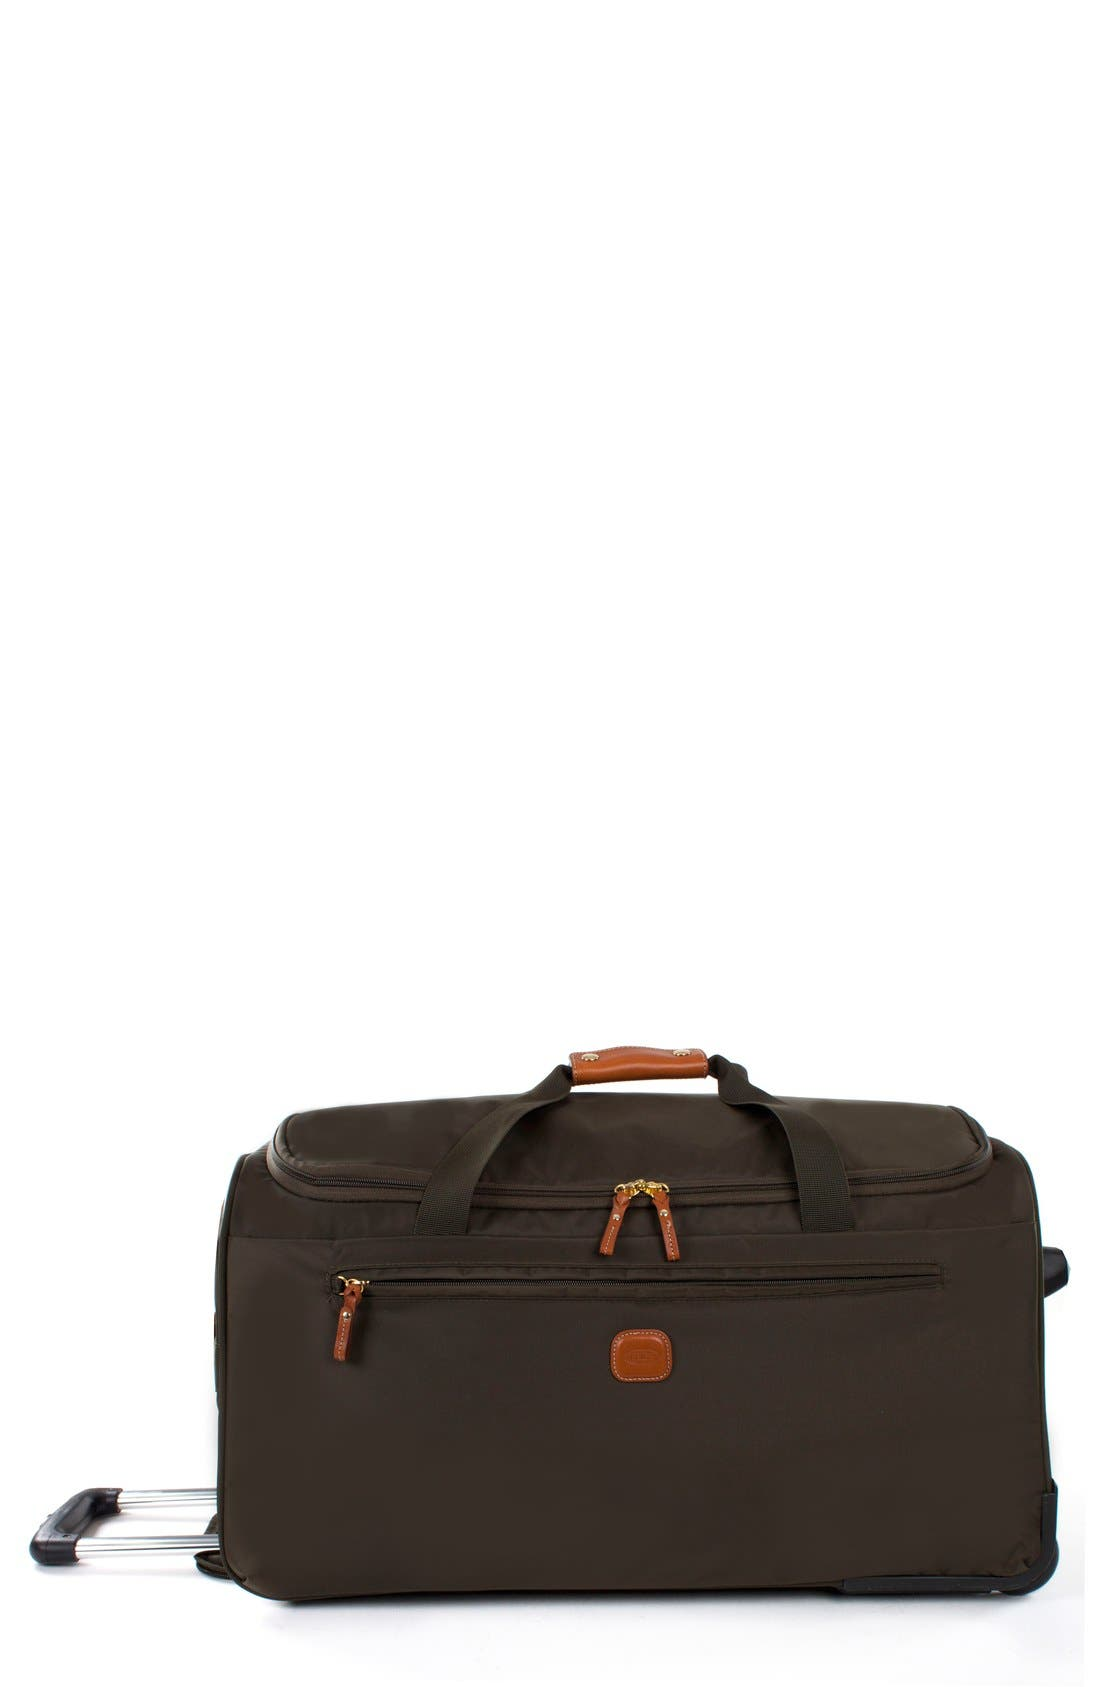 X-Bag 28-Inch Rolling Duffel Bag,                         Main,                         color, Olive